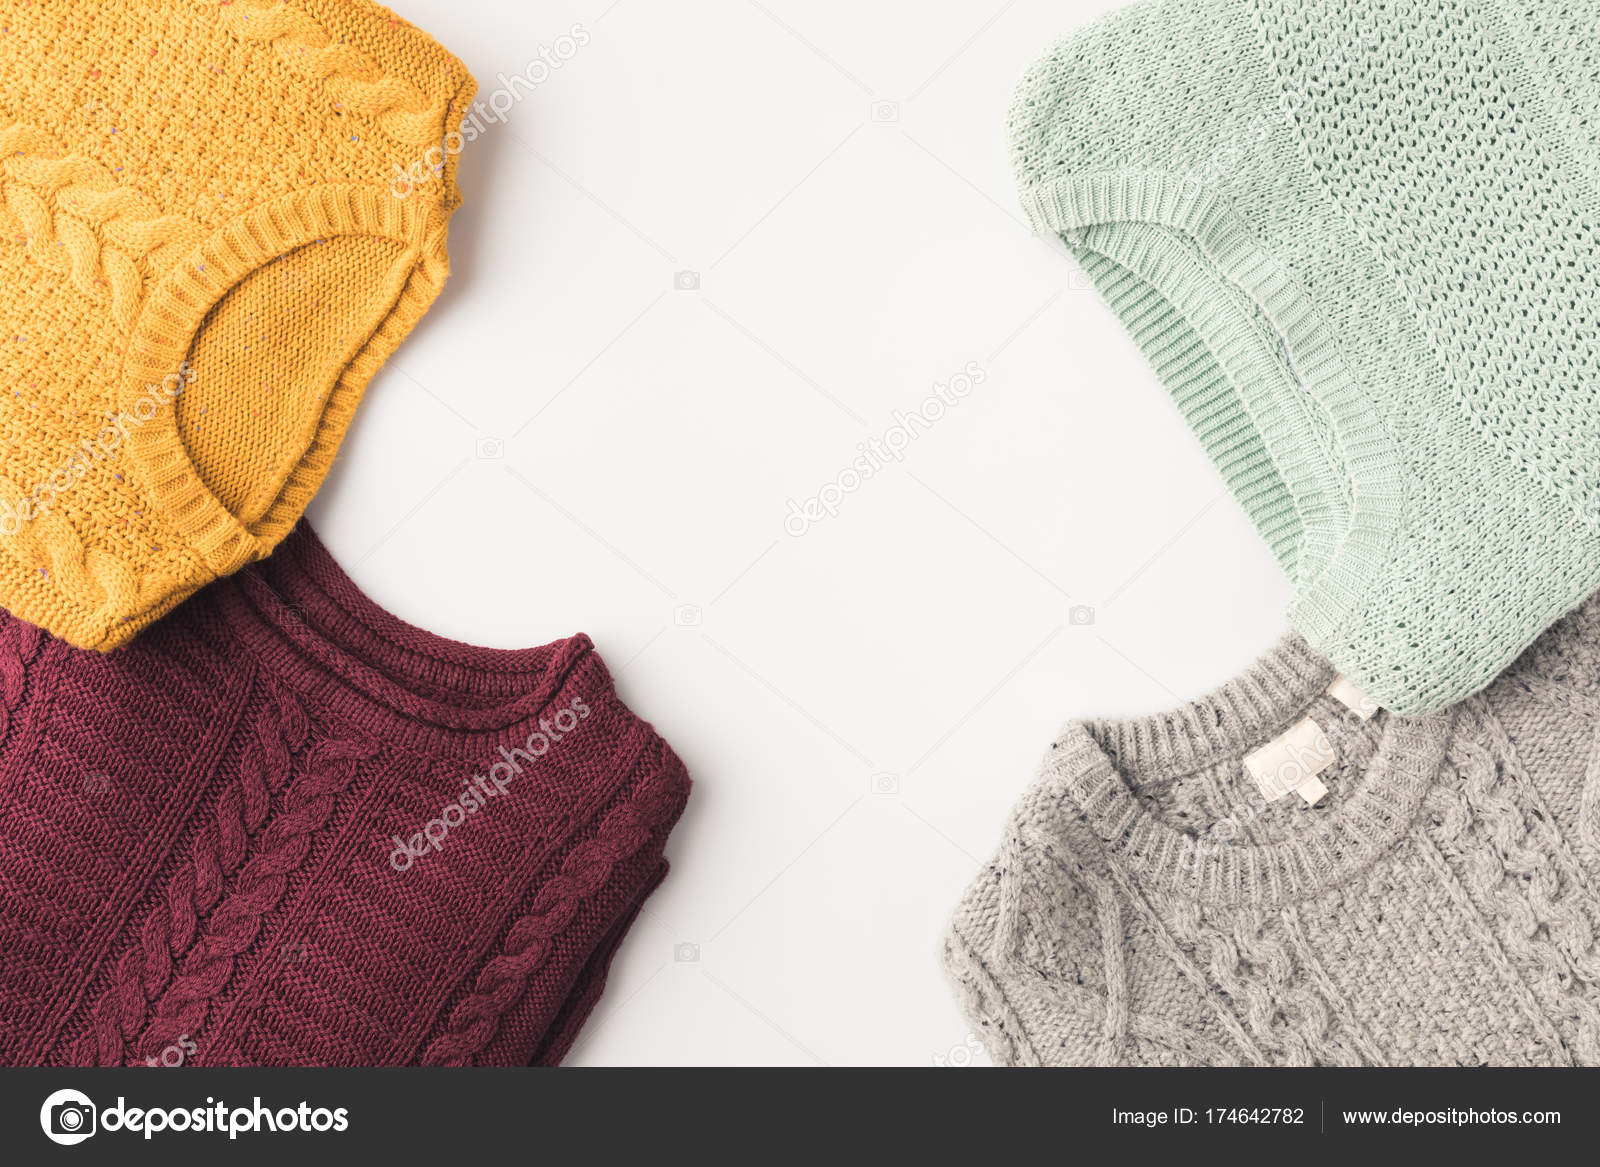 7e14a37d1e49 Ζεστά πλεκτά πουλόβερ — Φωτογραφία Αρχείου © AntonMatyukha  174642782